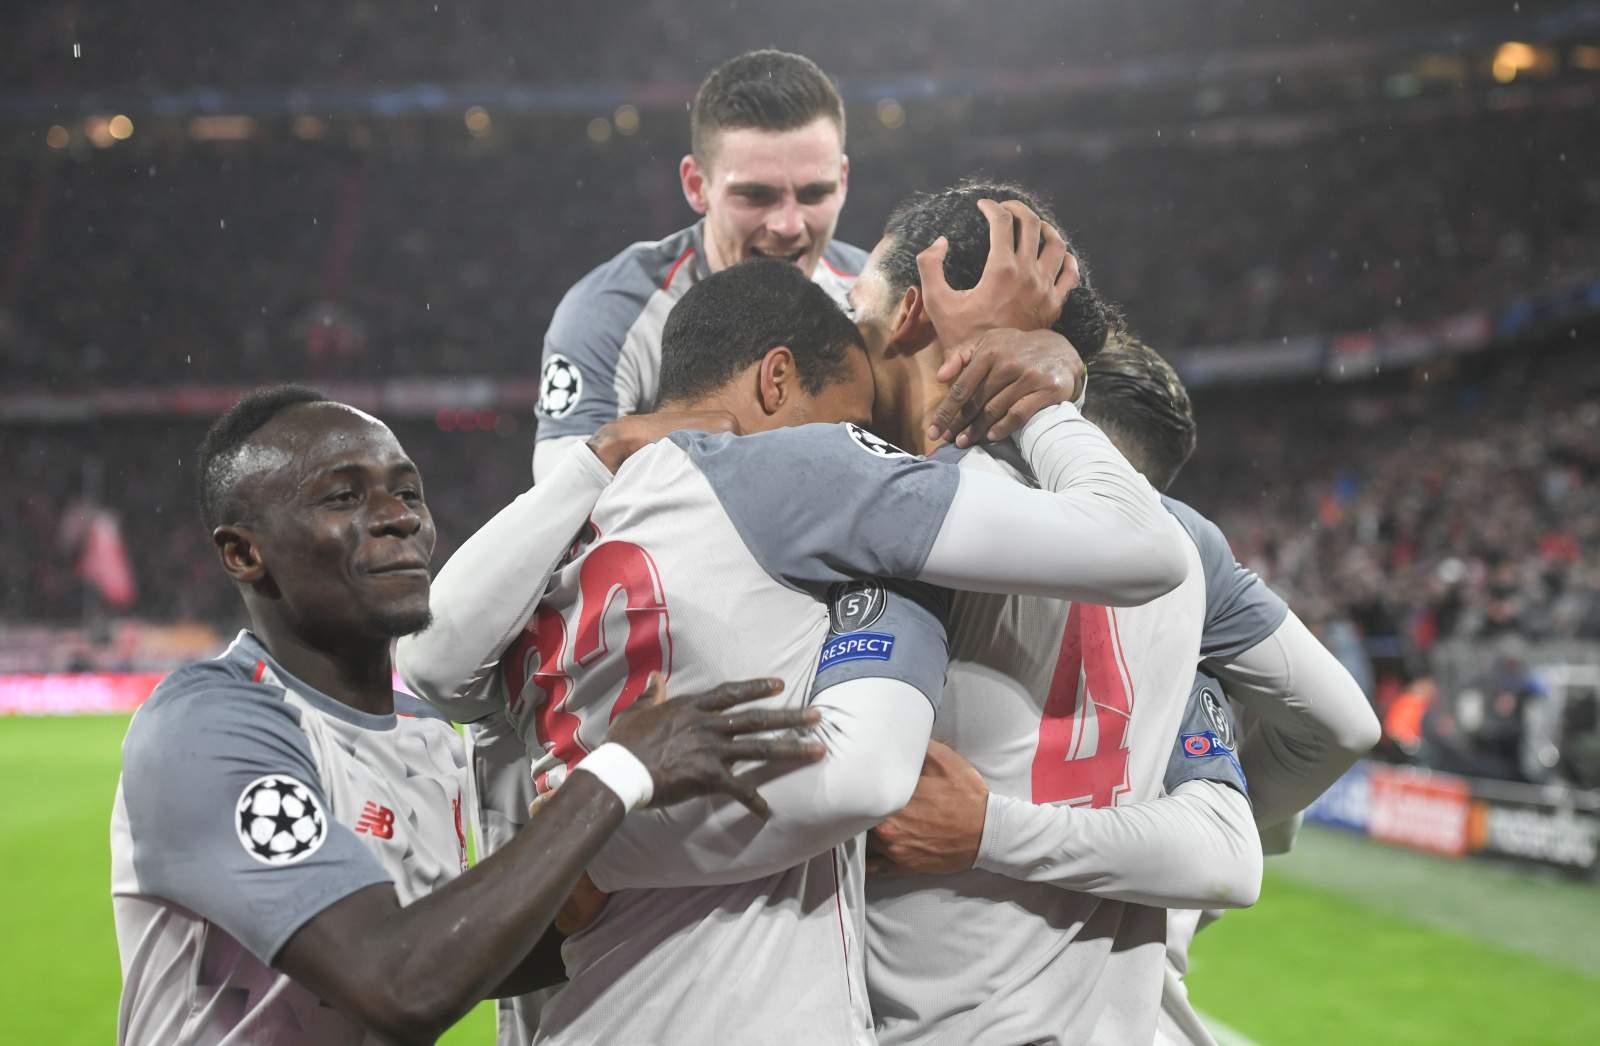 «Манчестер Юнайтед» - «Ливерпуль»: прогноз на матч Кубка Англии – 24 января 2021